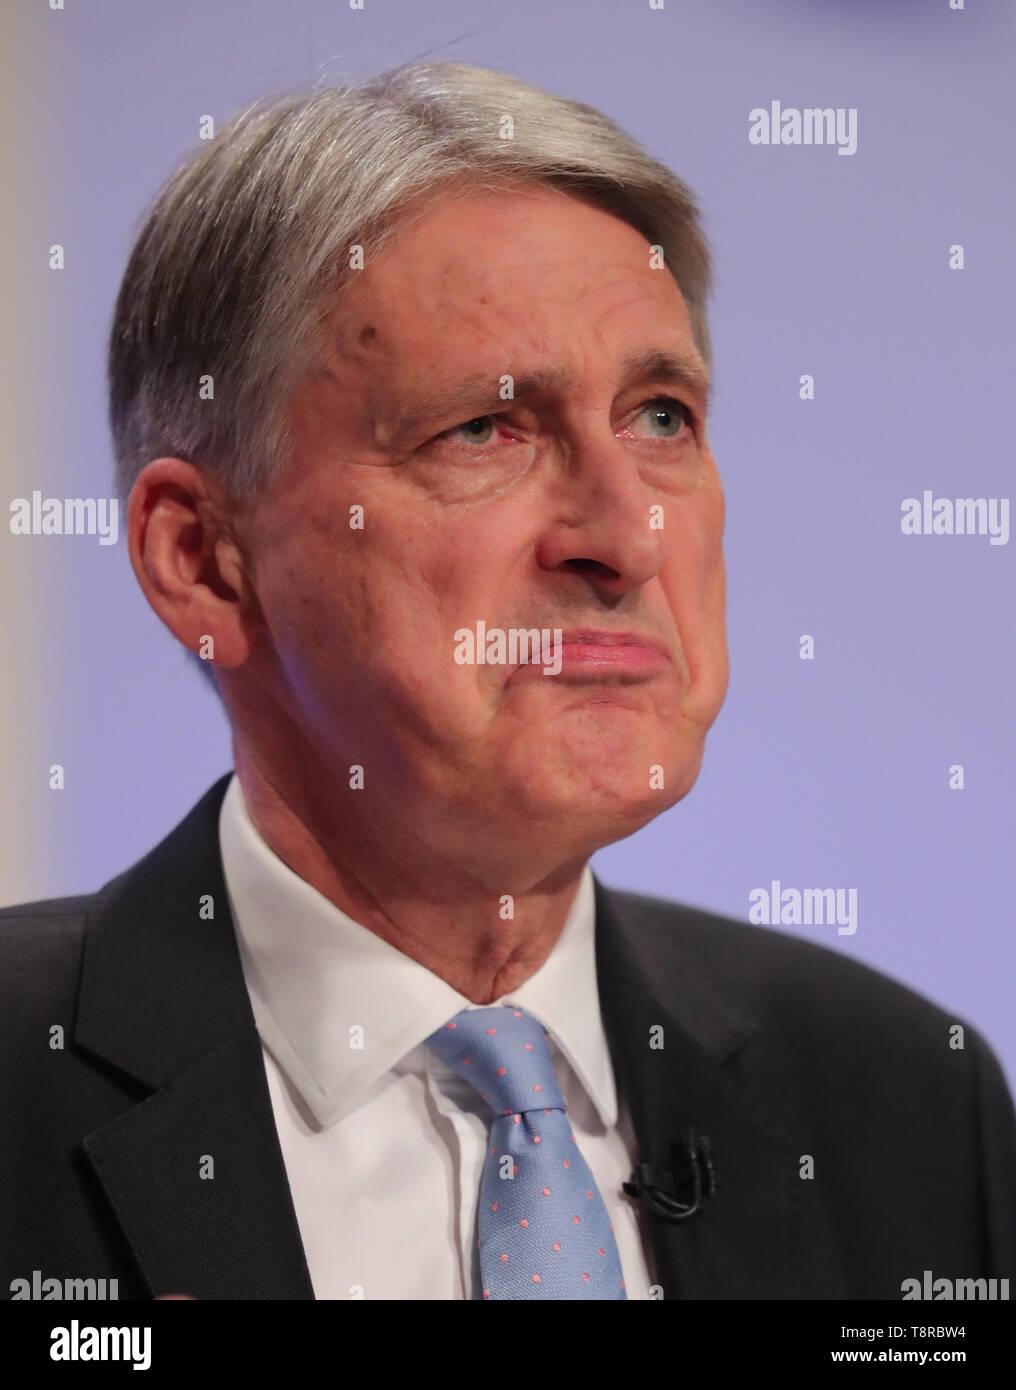 PHILIP HAMMOND MP, 2018 - Stock Image